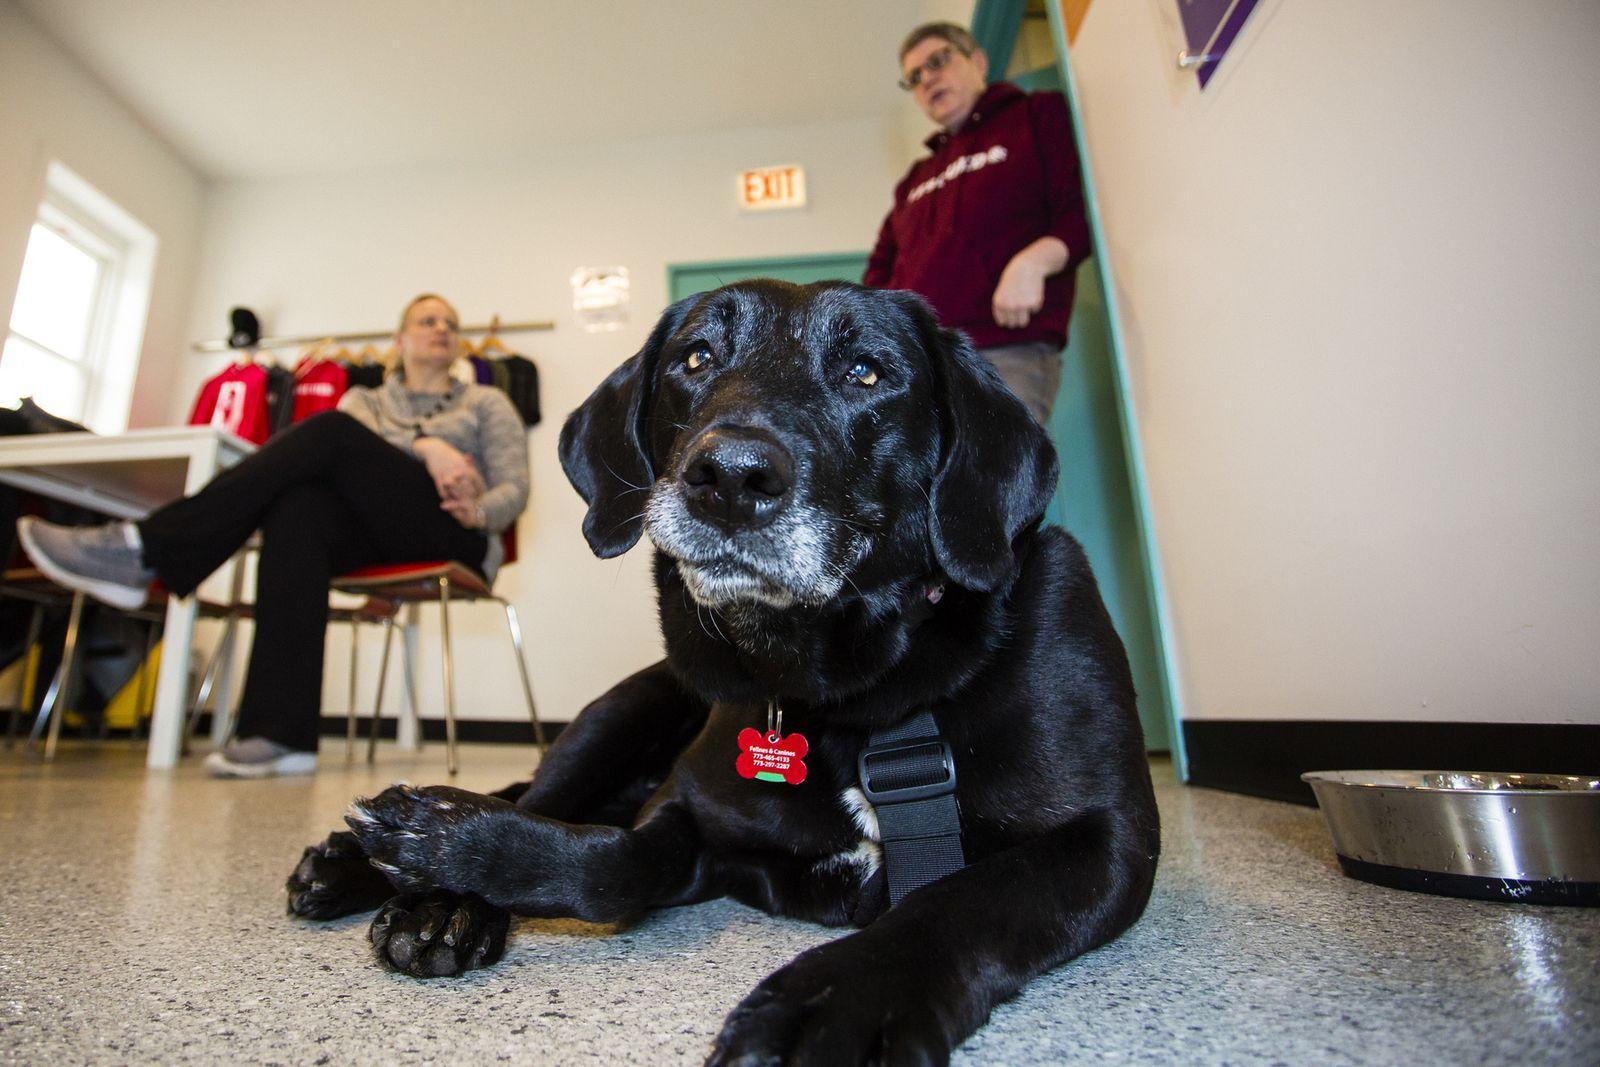 Bunny, the Alabama fund-raising dog